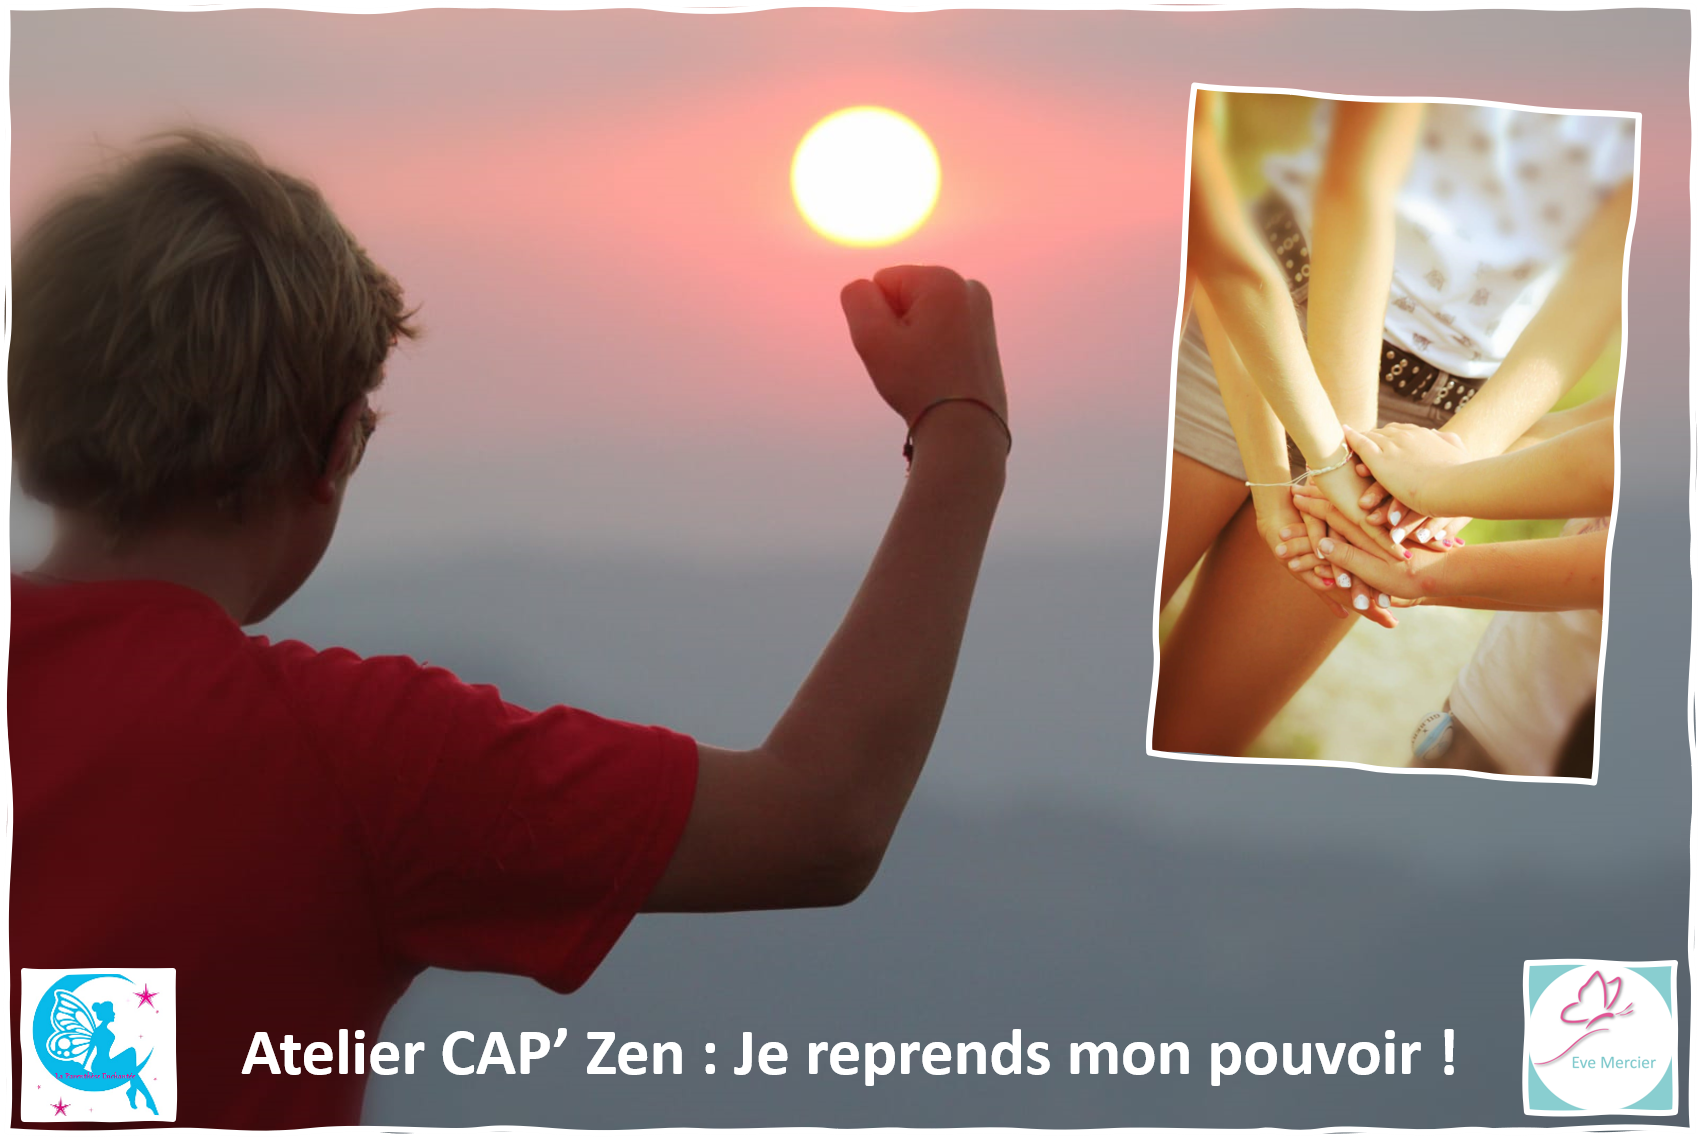 Atelier CAP'Zen : Je reprends mon pouvoir ! Ados – Samedi 11 juillet 2020